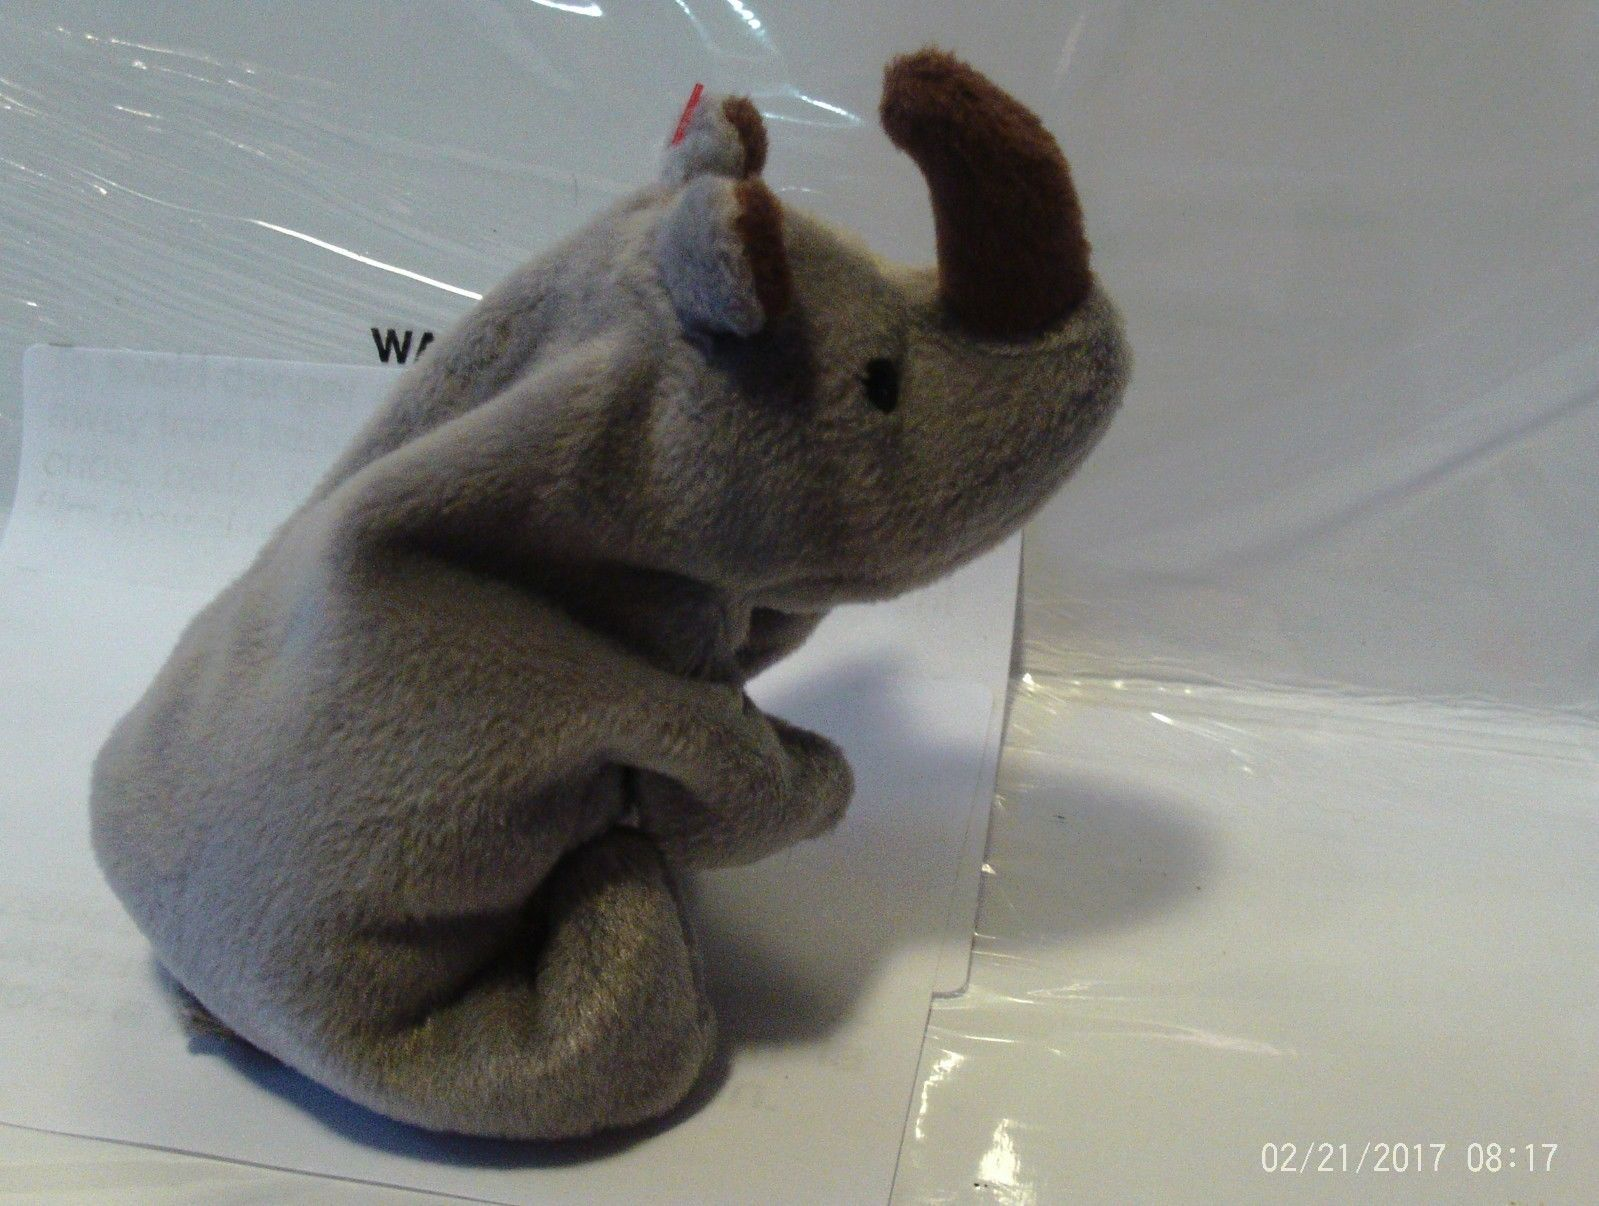 1ST Edition Beanie Babies Rare Spike the Rhino, No star, No stamp, PVC